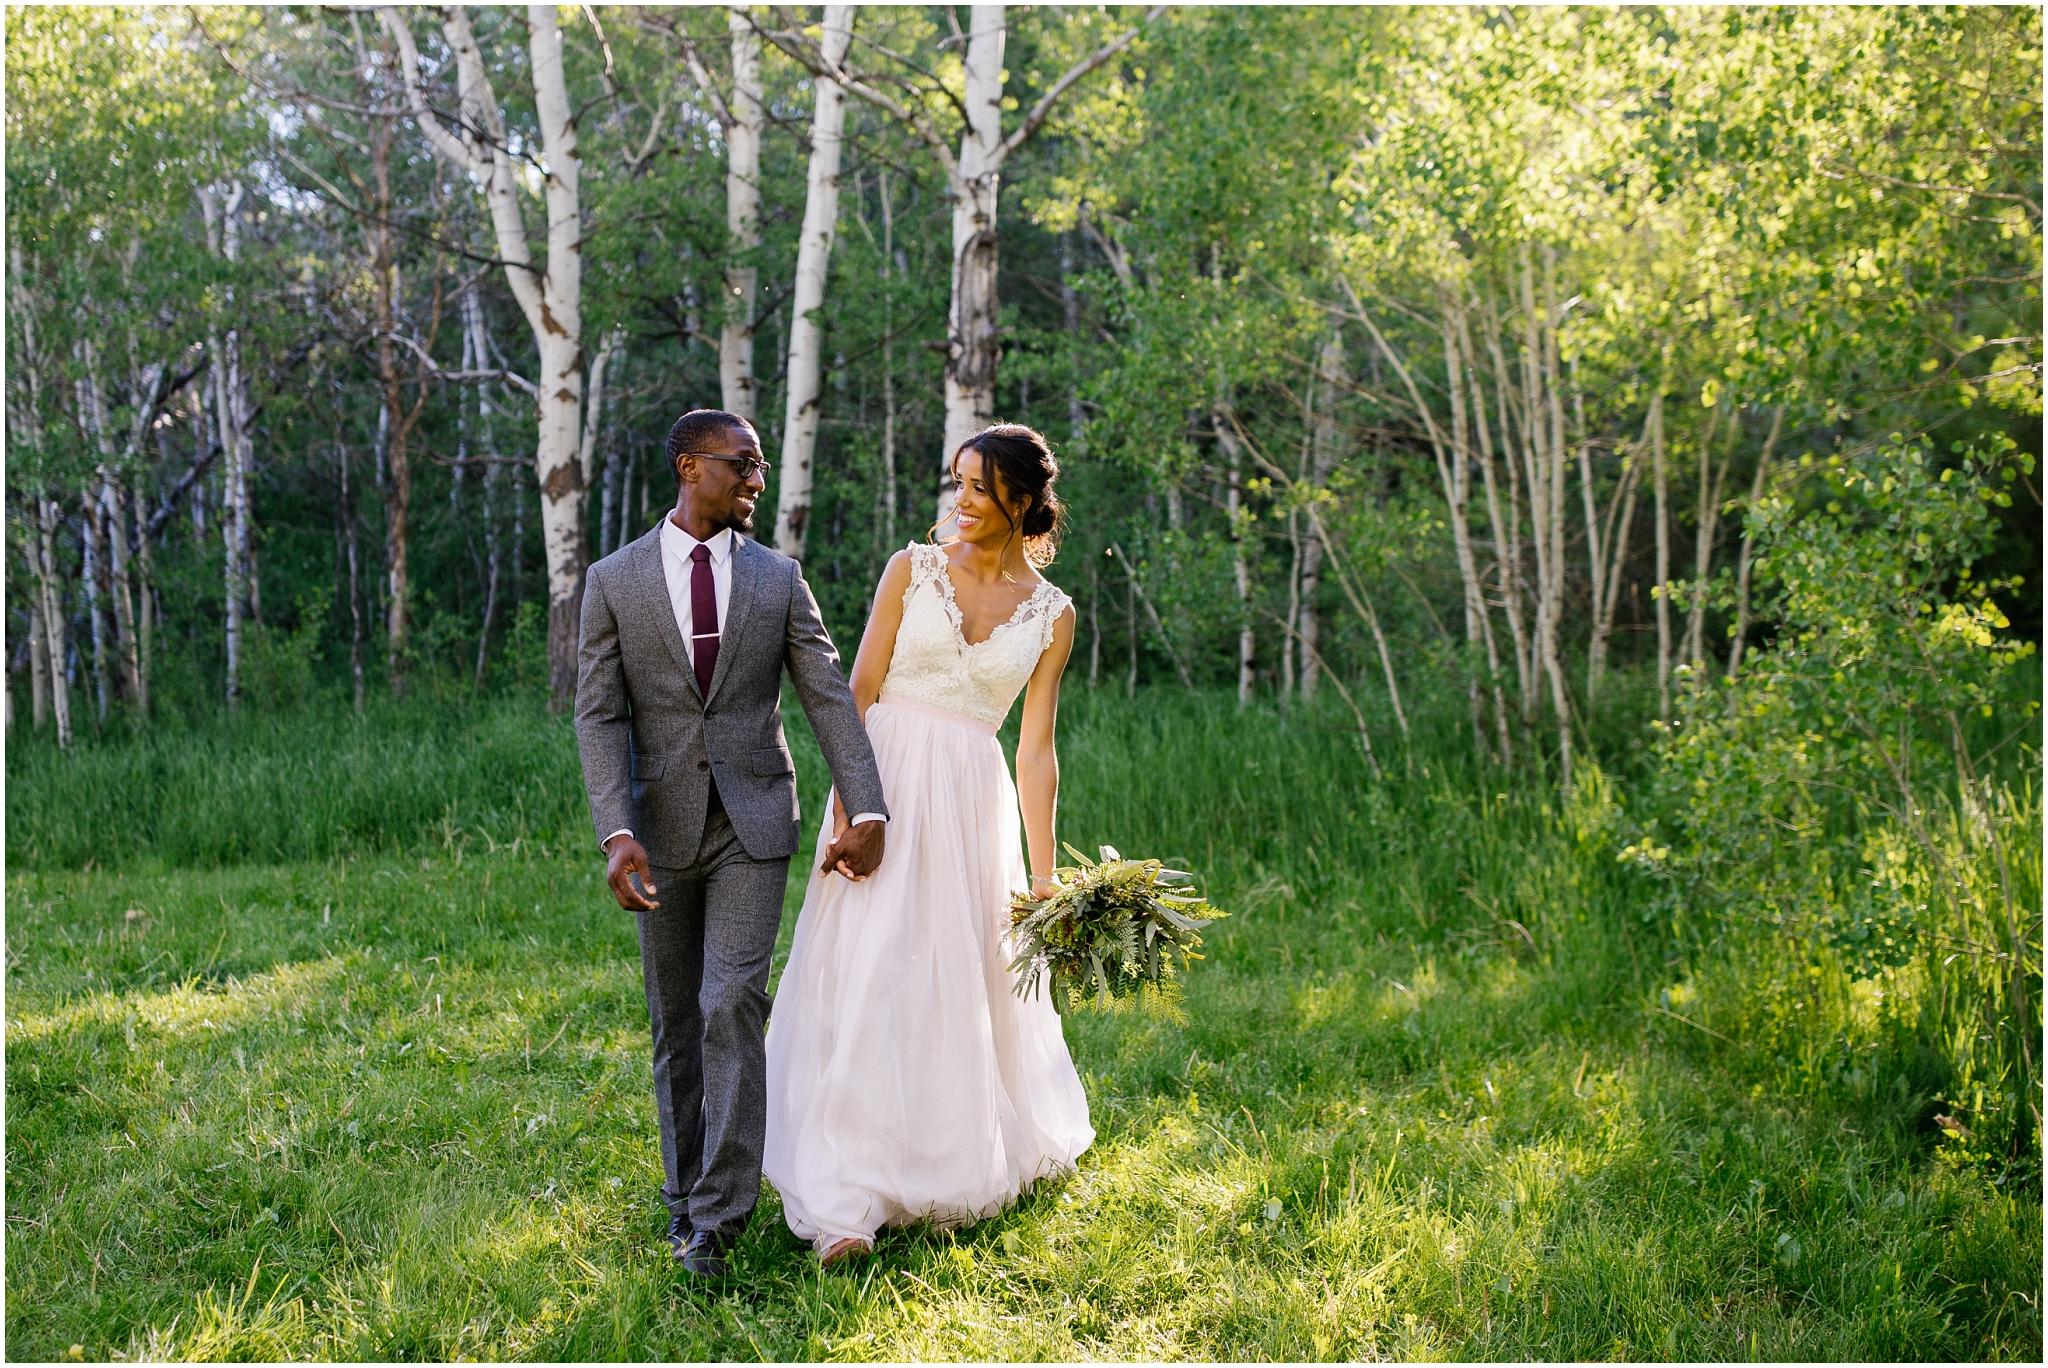 TreeHorseShoot-45_Lizzie-B-Imagery-Utah-Wedding-Photographer-Salt-Lake-City-Park-City-Oakley.jpg